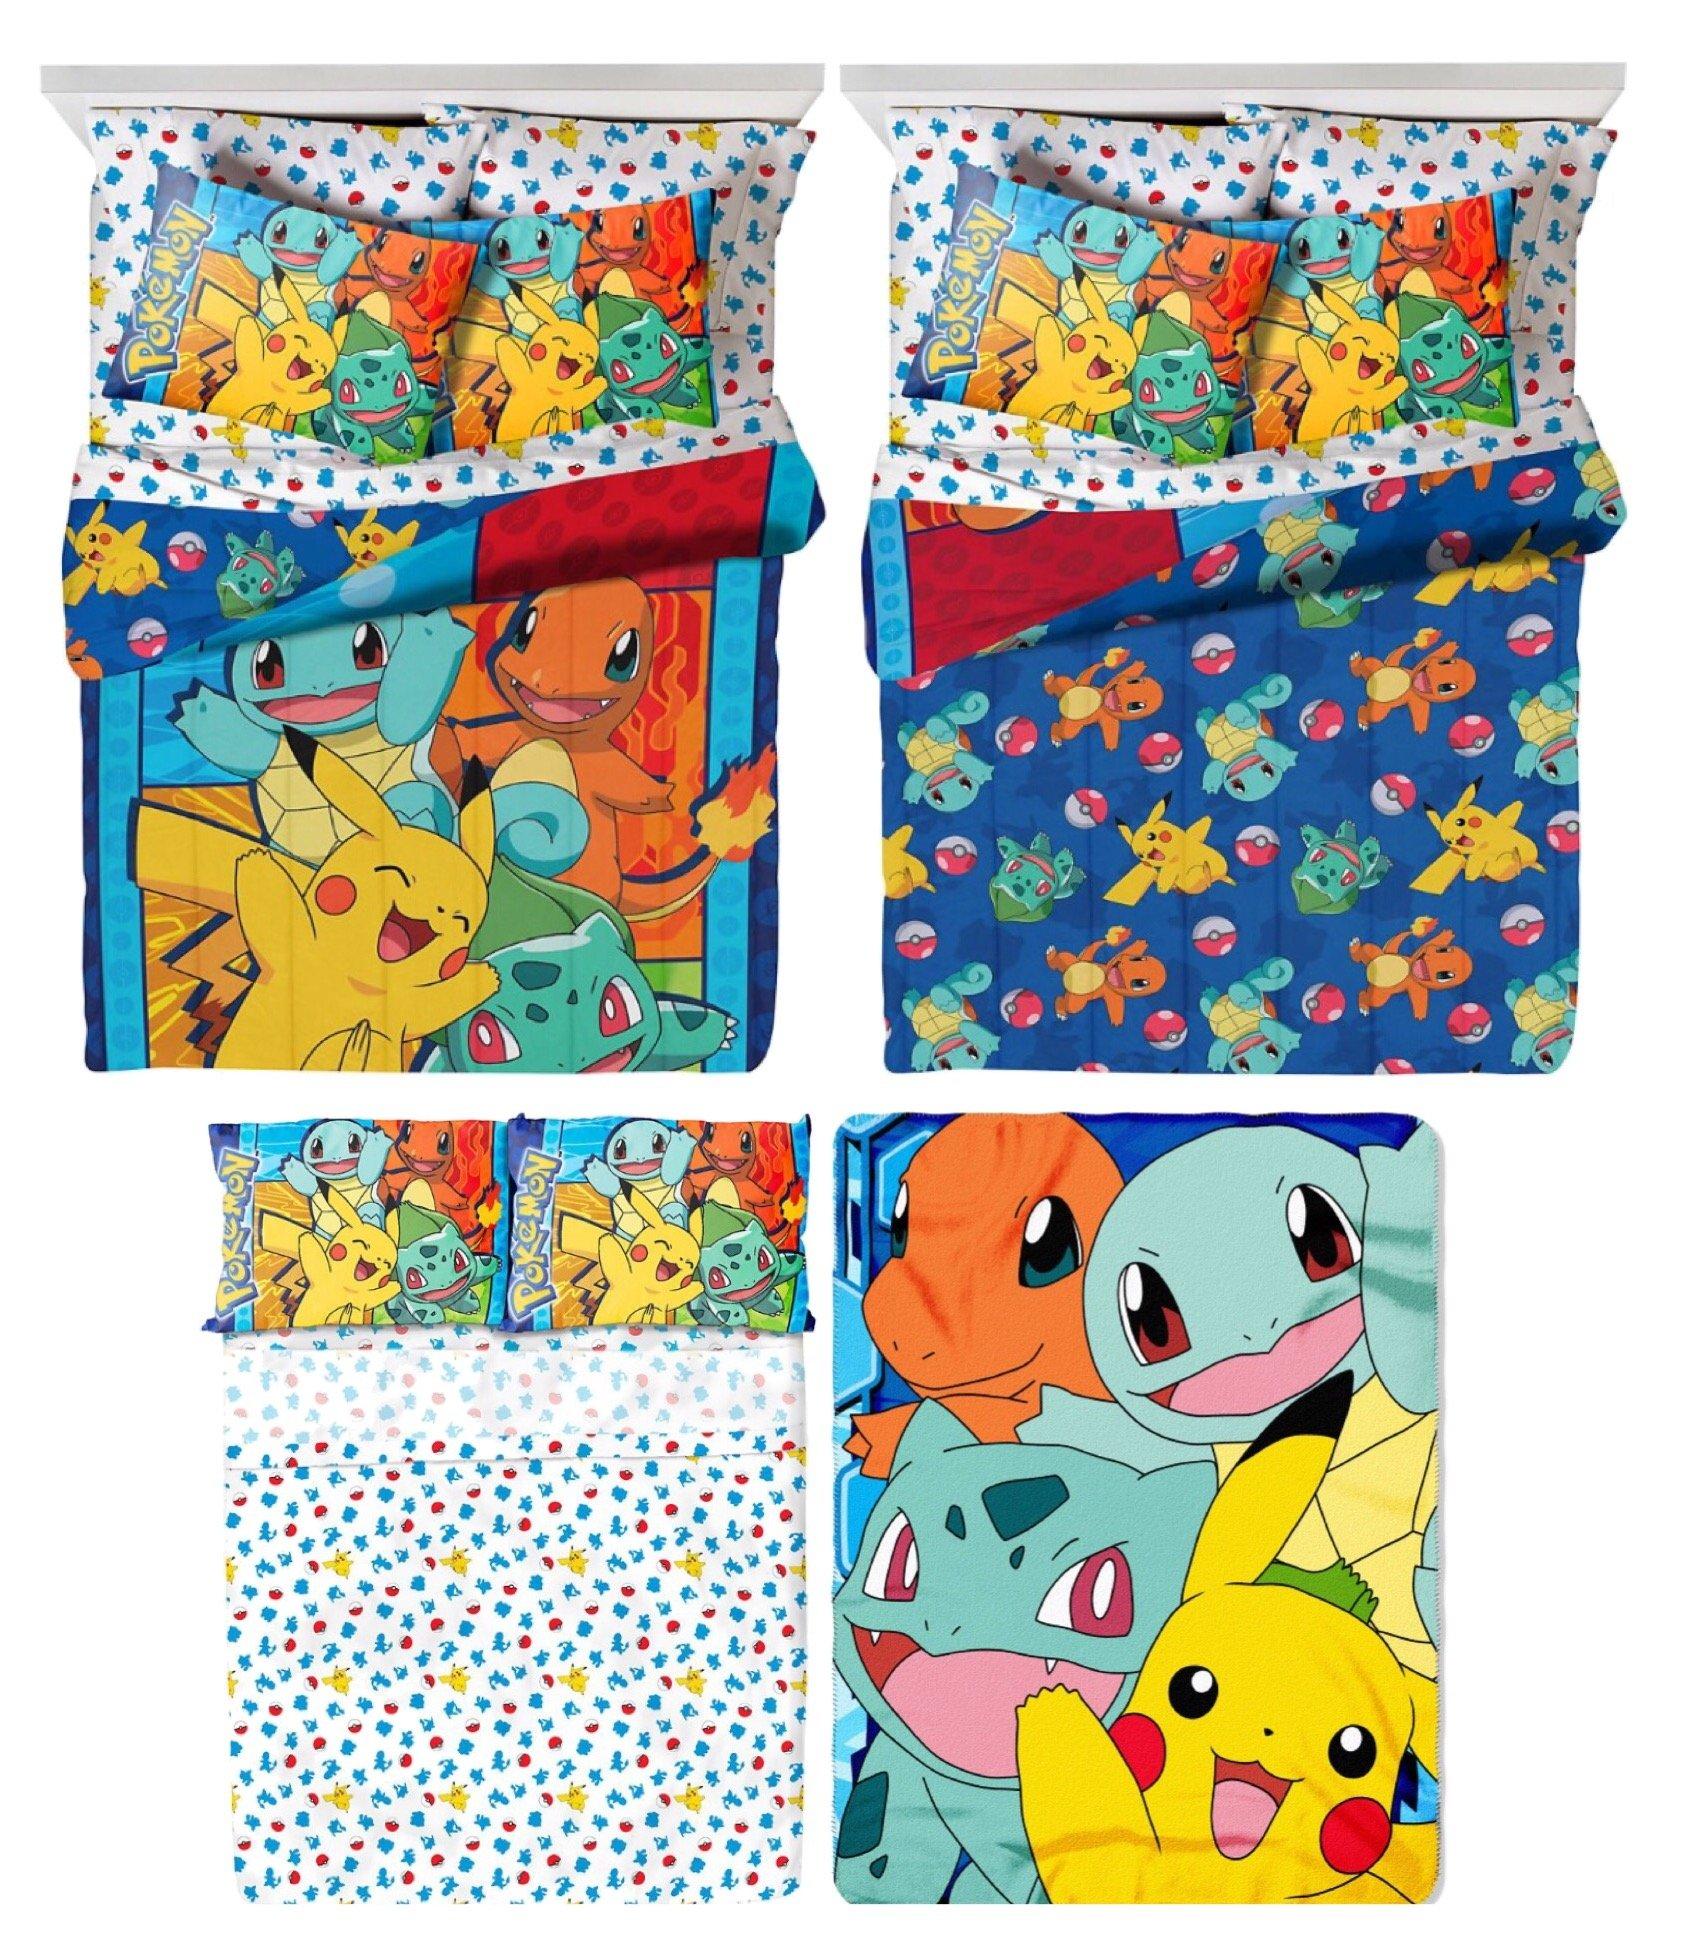 Pokémon 6 Piece Kids Full Bedding Set - Reversible Comforter, Sheet Set with 2 Reversible Pillowcases and Ultra Soft Throw Blanket